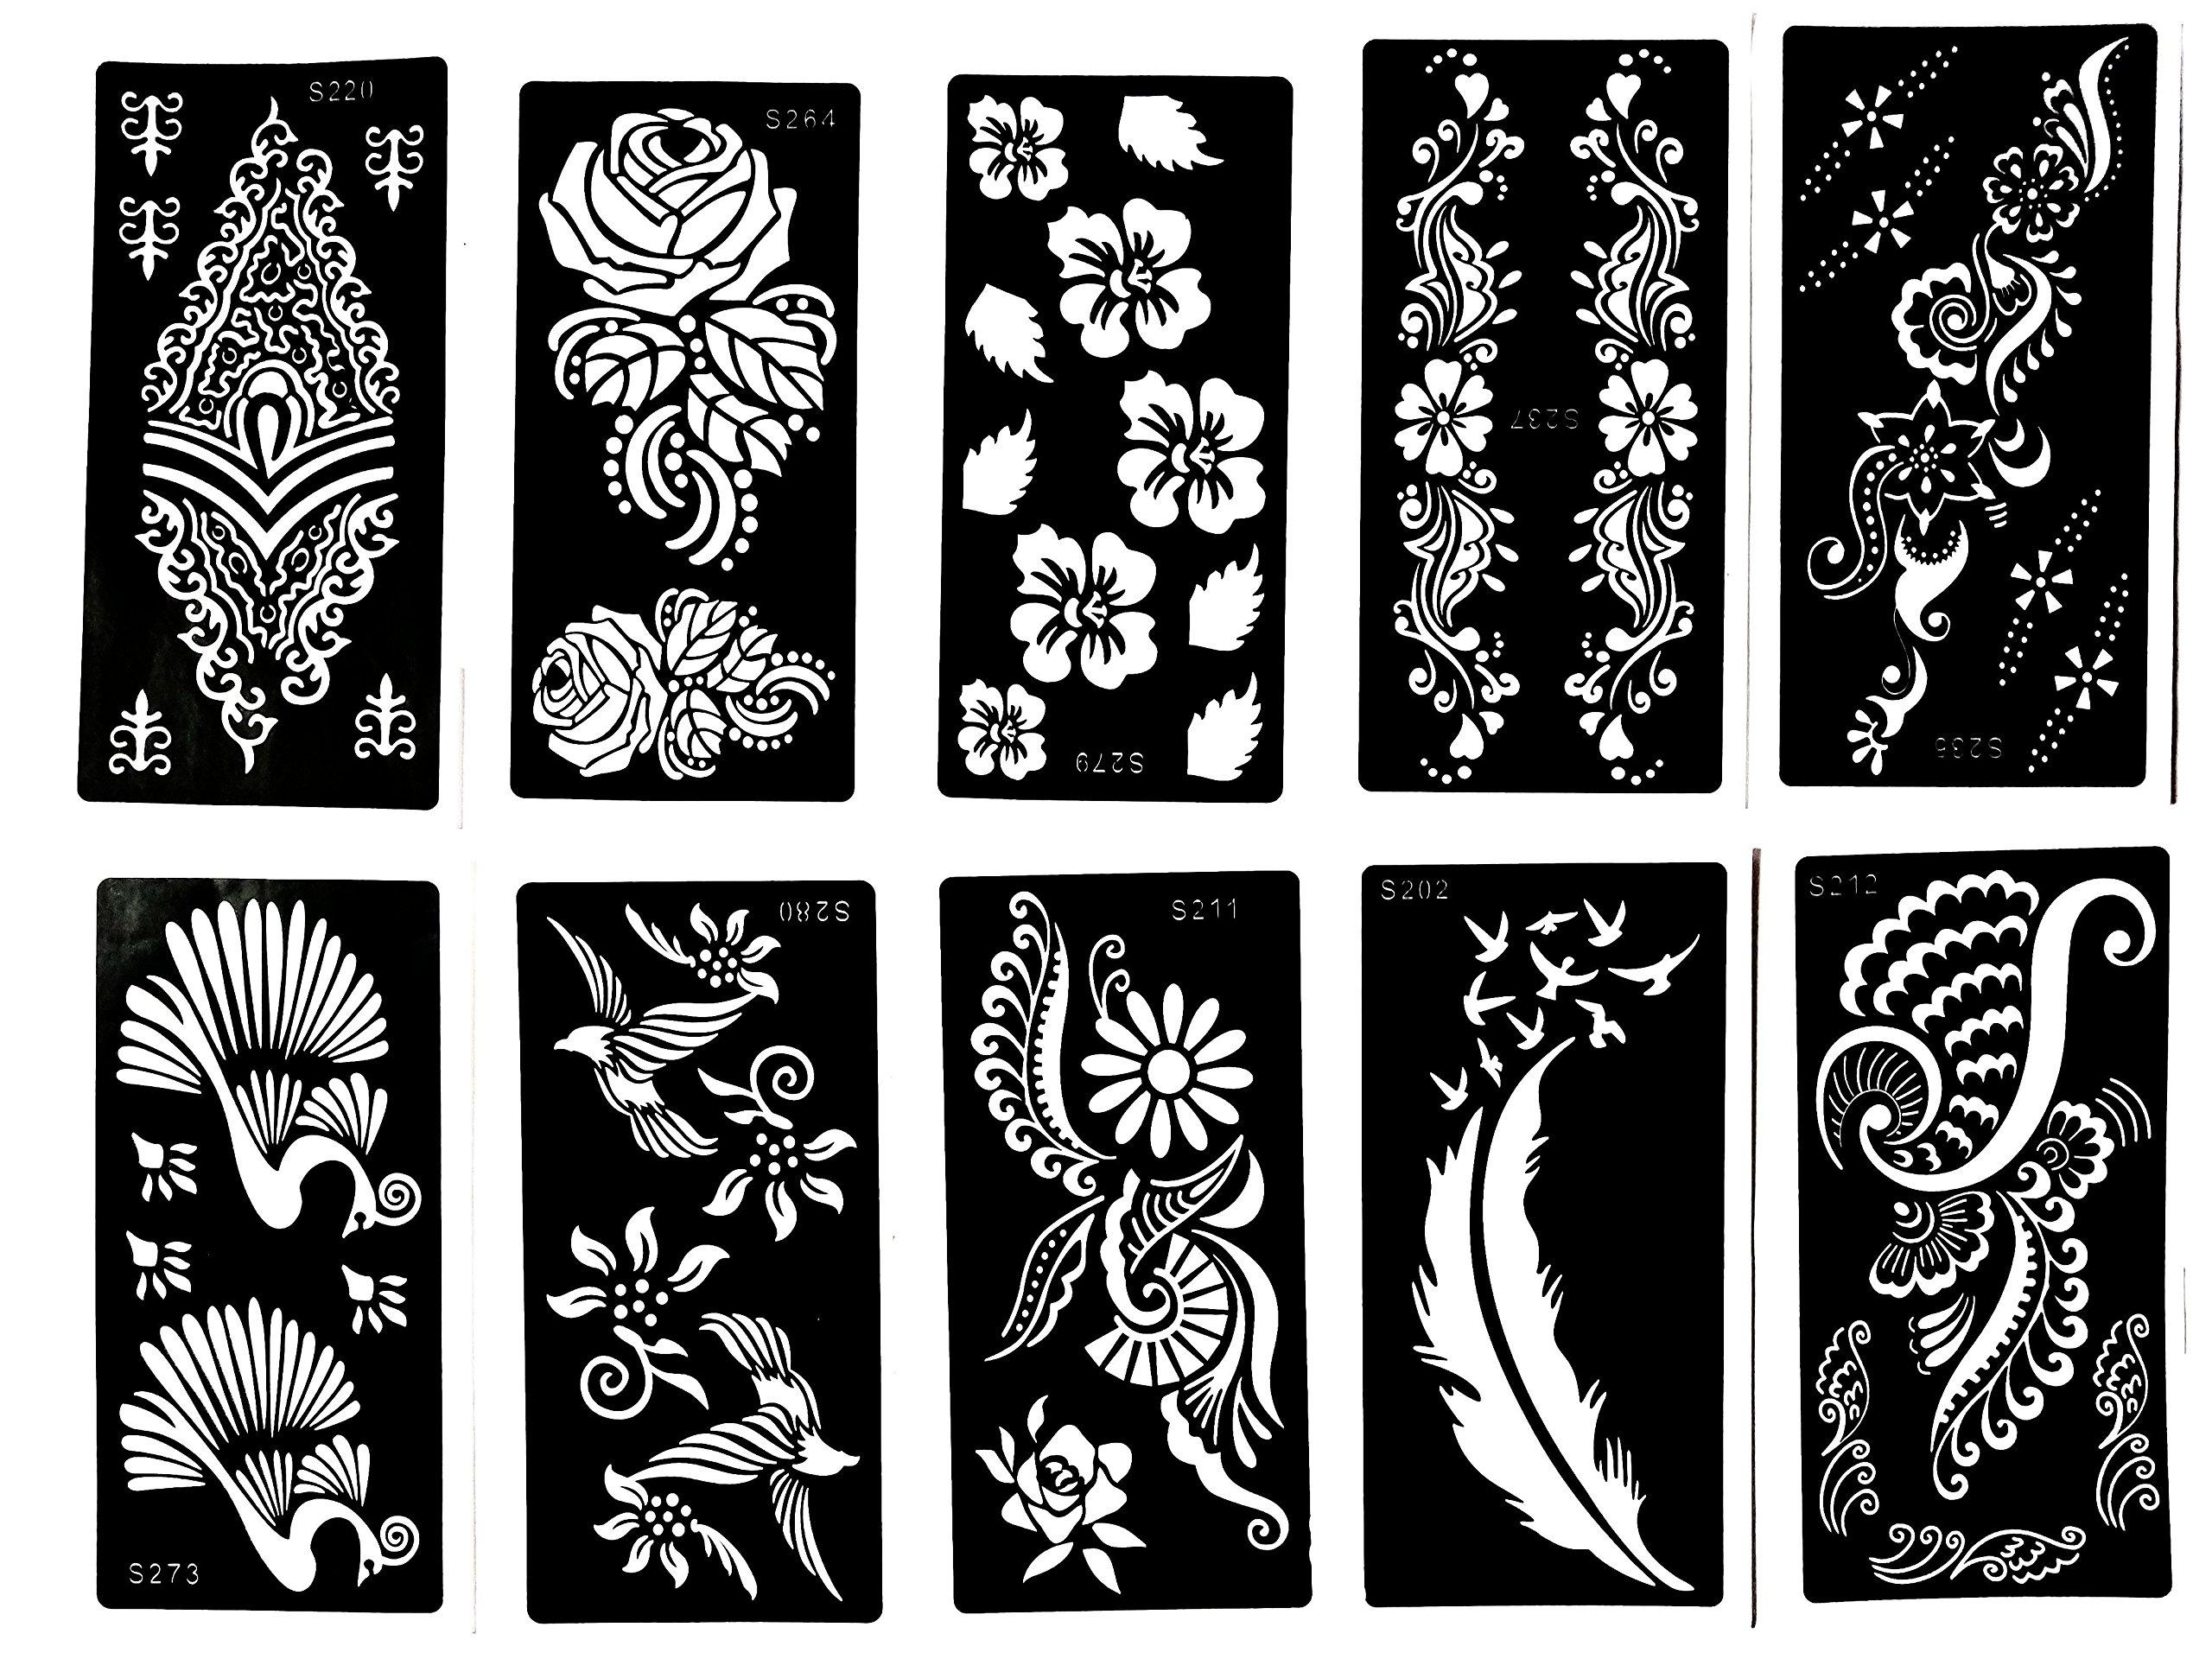 Temporary Tattoo Stencils Henna: Amazon.com : Henna Stencil Tattoo (10 Sheets) Self